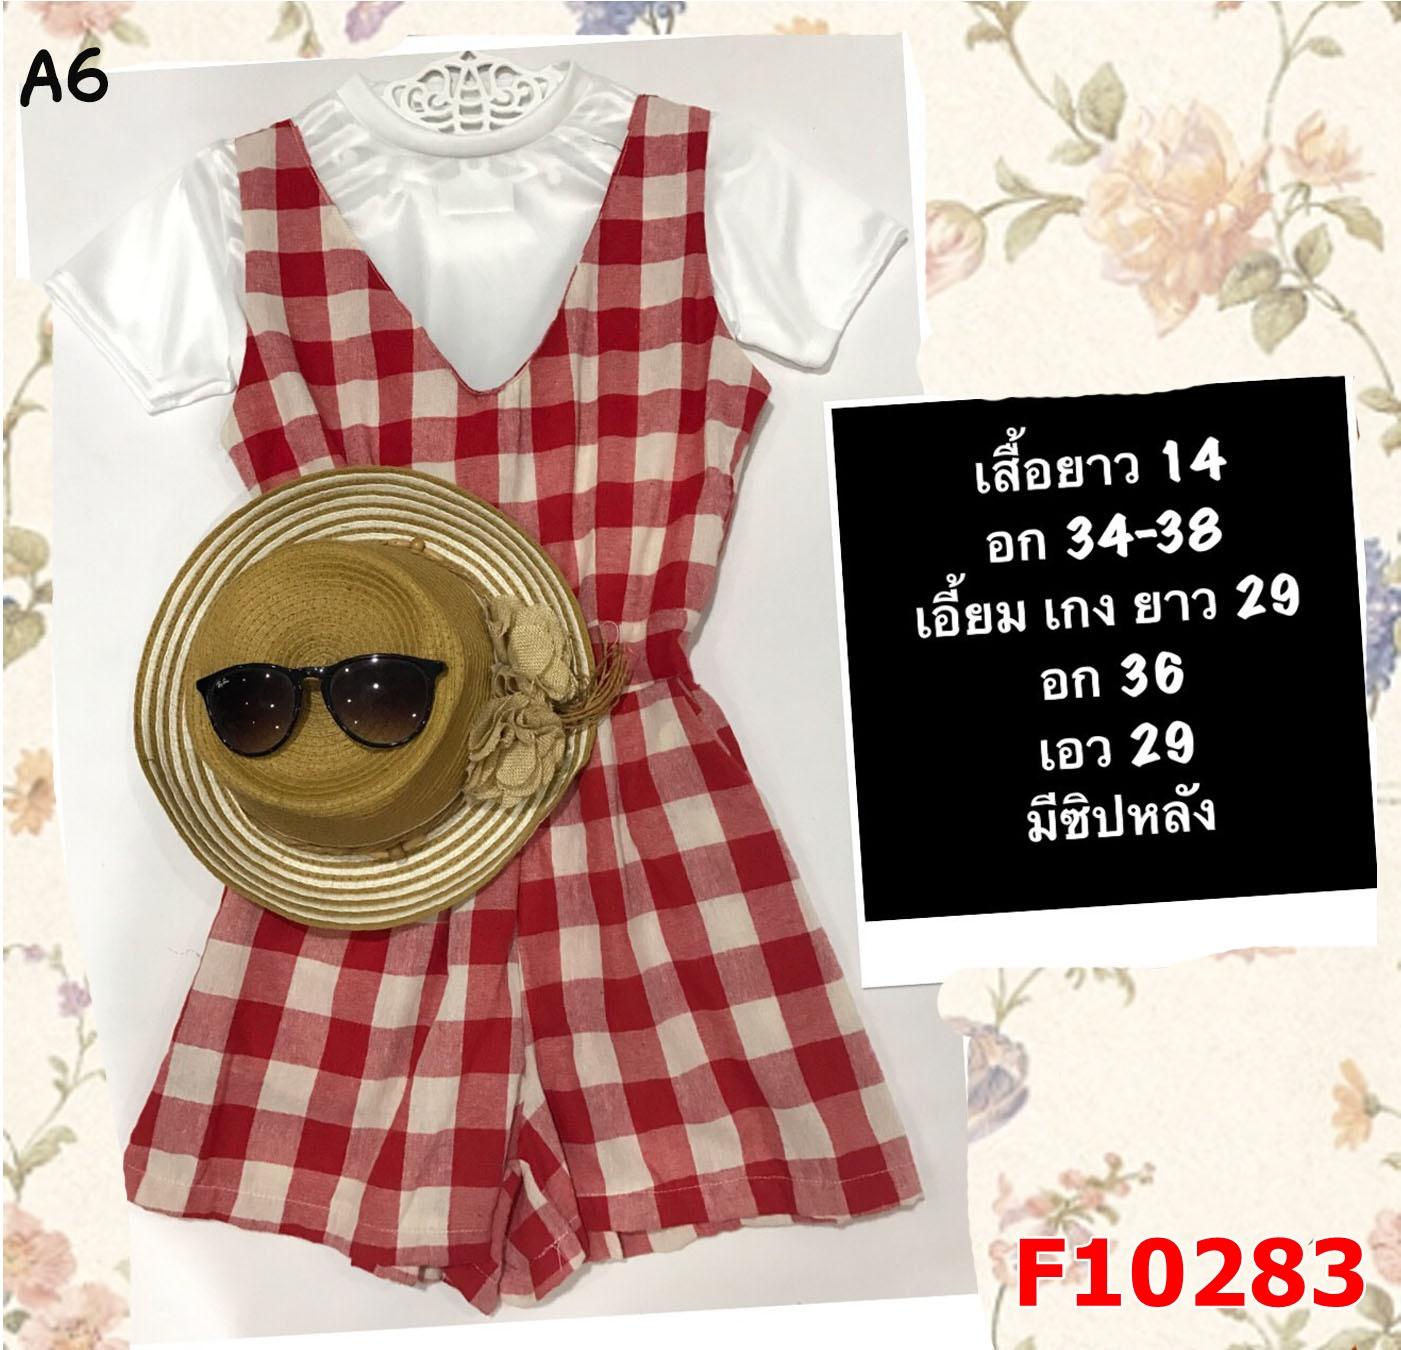 F10283 เซต 2 ชิ้น เอ๊๊ยมกางเกง ลายสก๊อต (งานซิปหลัง) สีแดง/ขาว + เสื้อตัวใน